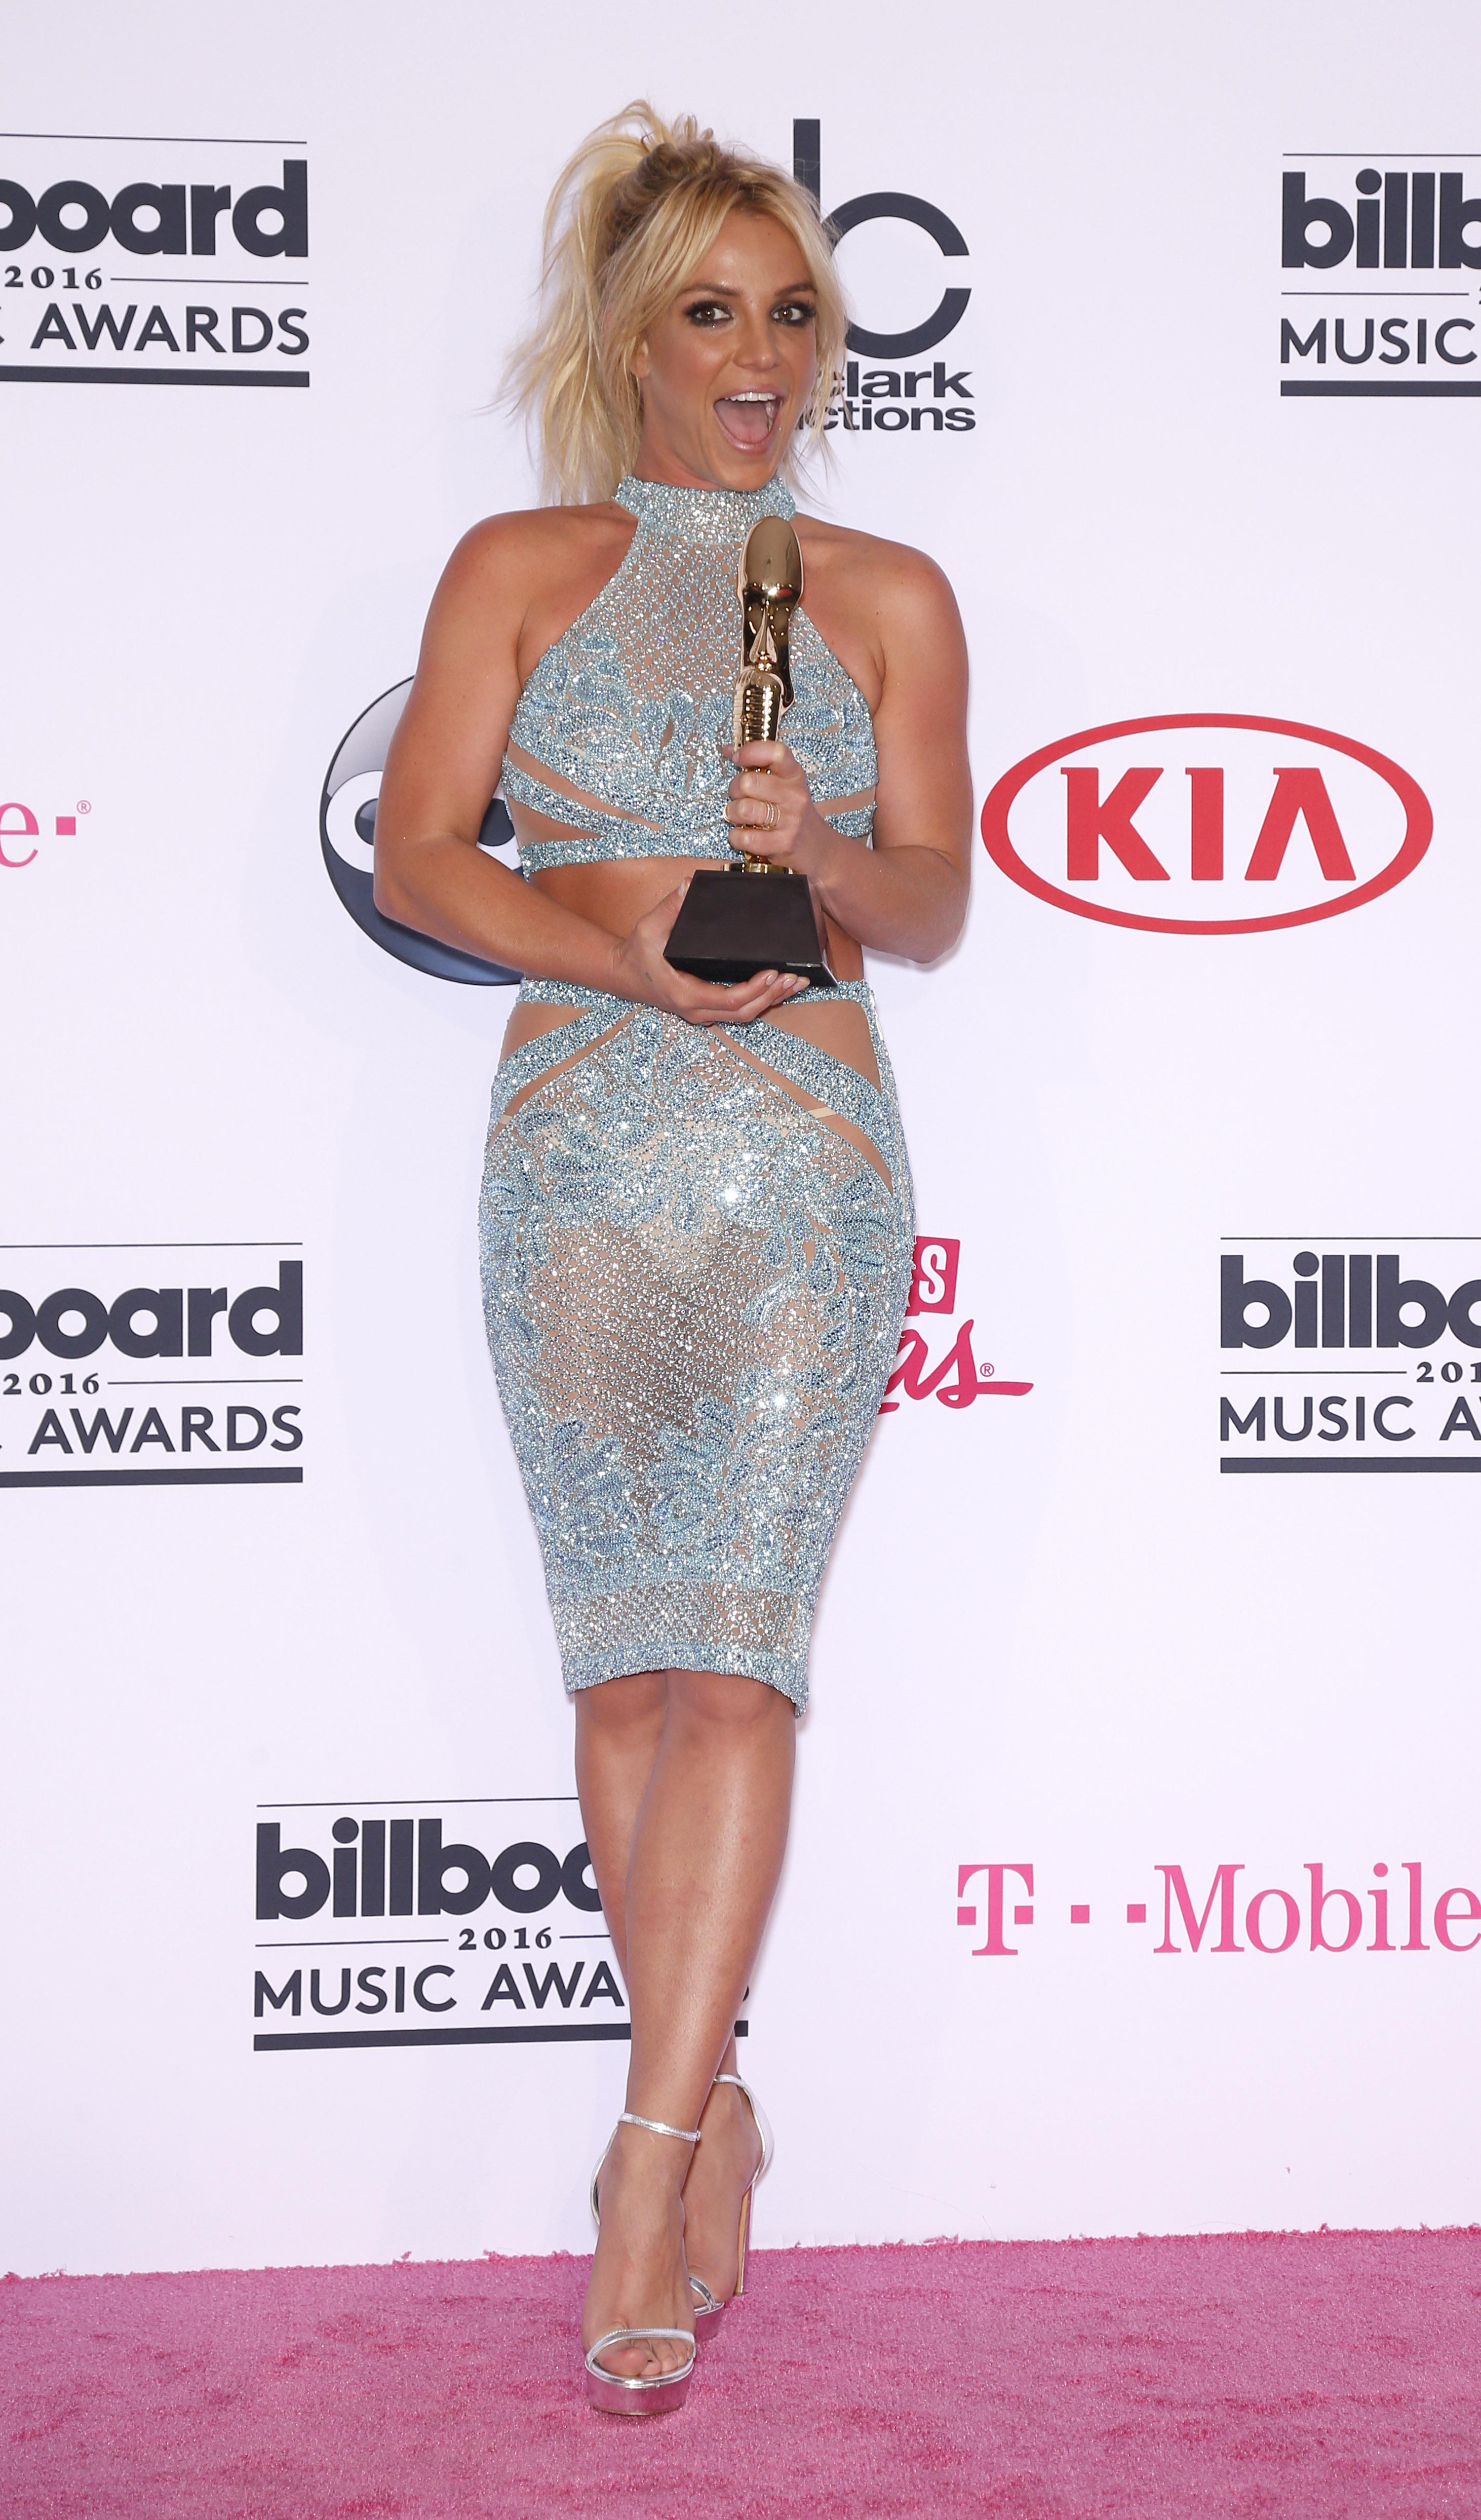 2016 Billboard Music Awards Winners